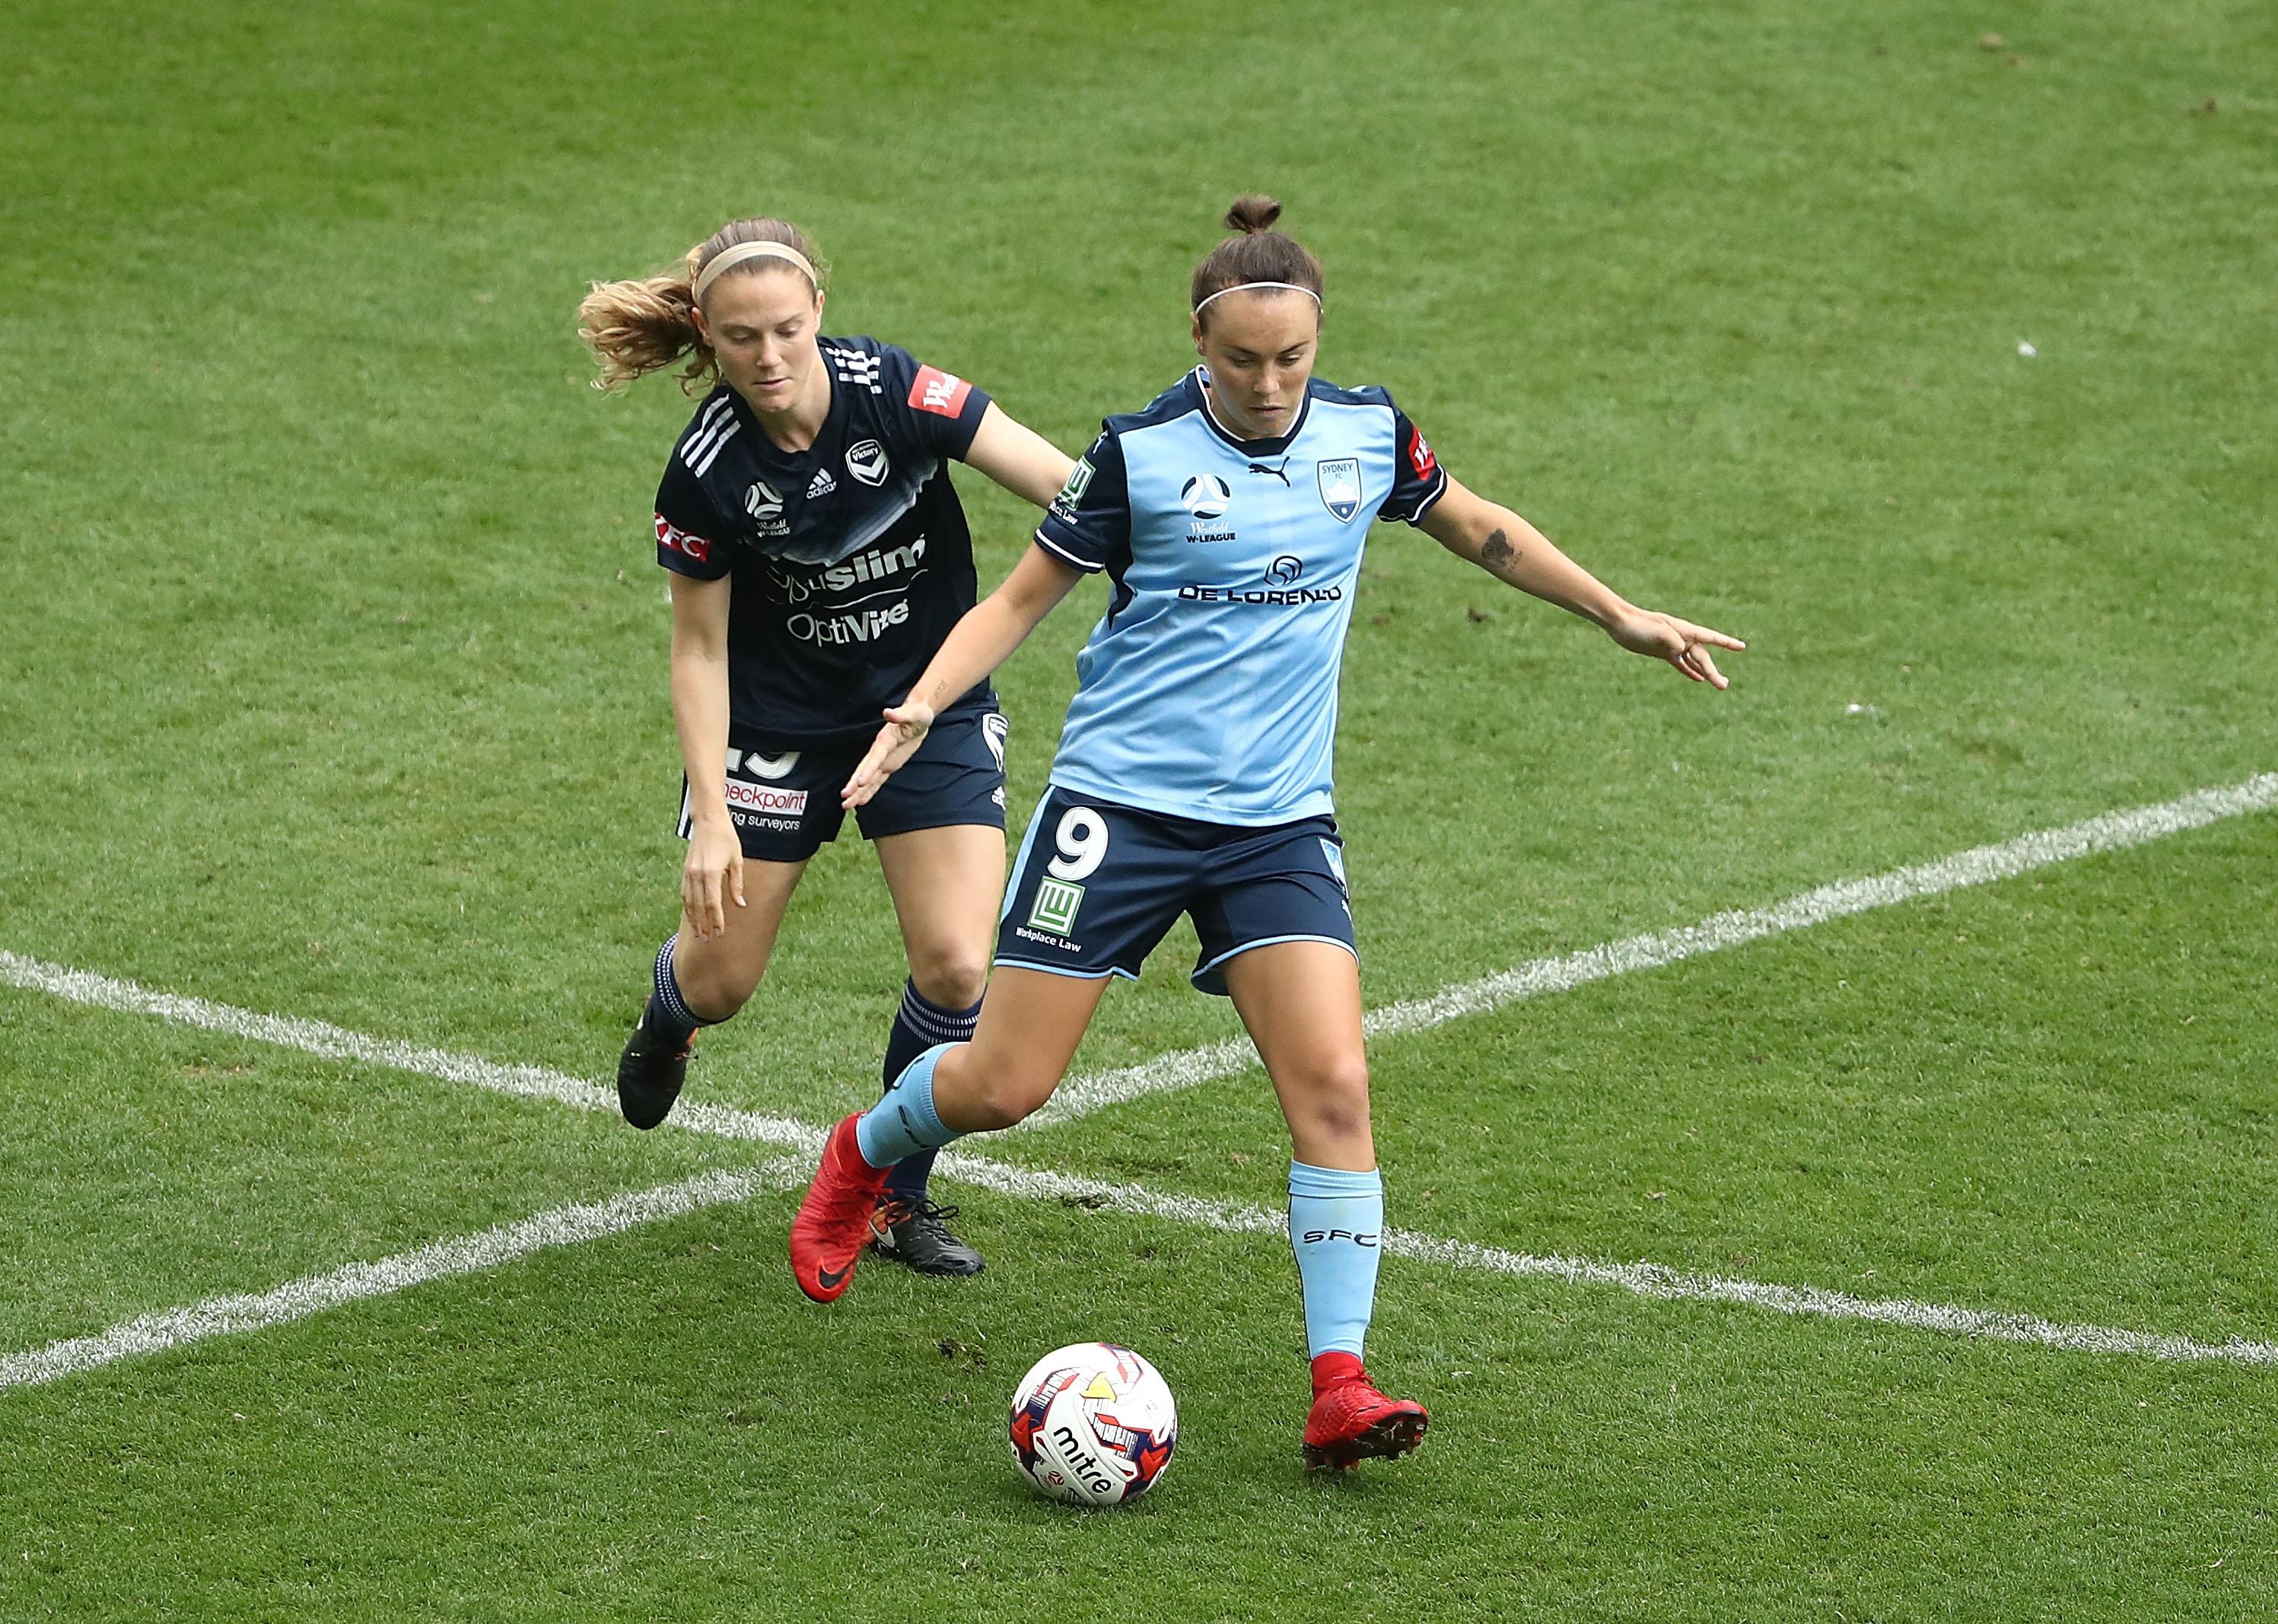 W-League Rd 13 - Melbourne v Sydney